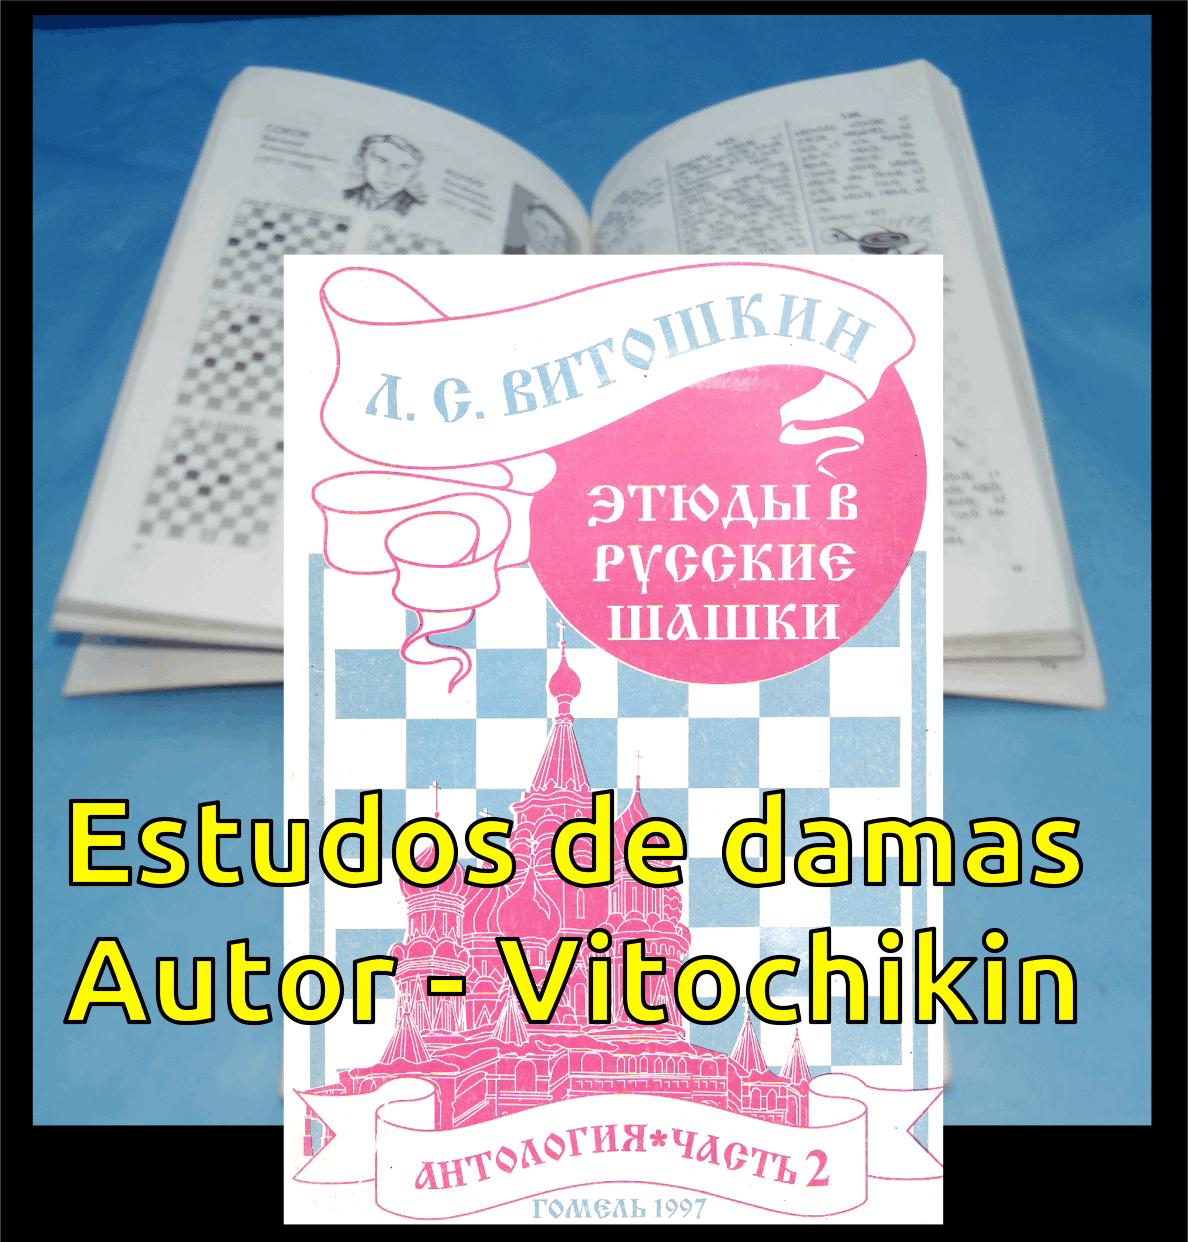 Estudos de damas Vitochikin